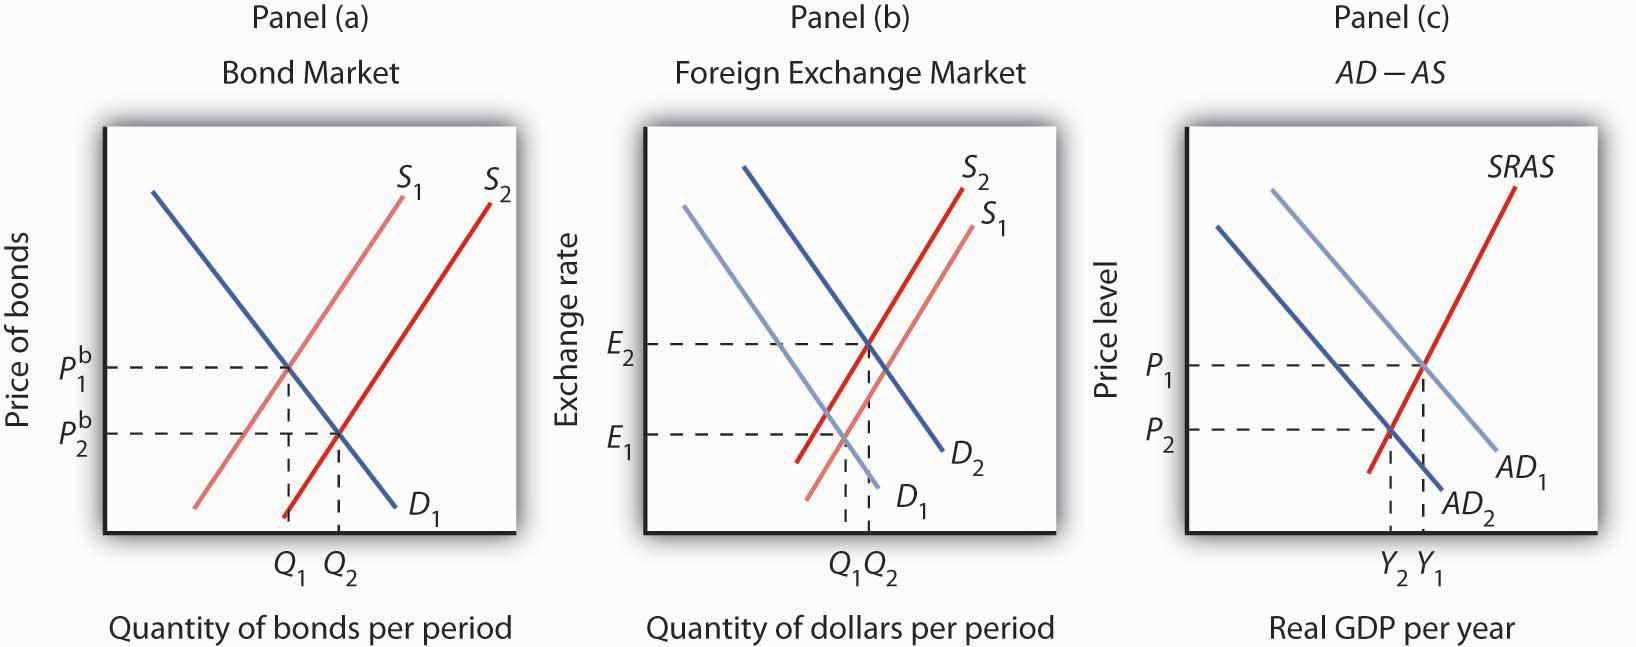 Forex graph ap macroeconomics ~ blogger.com